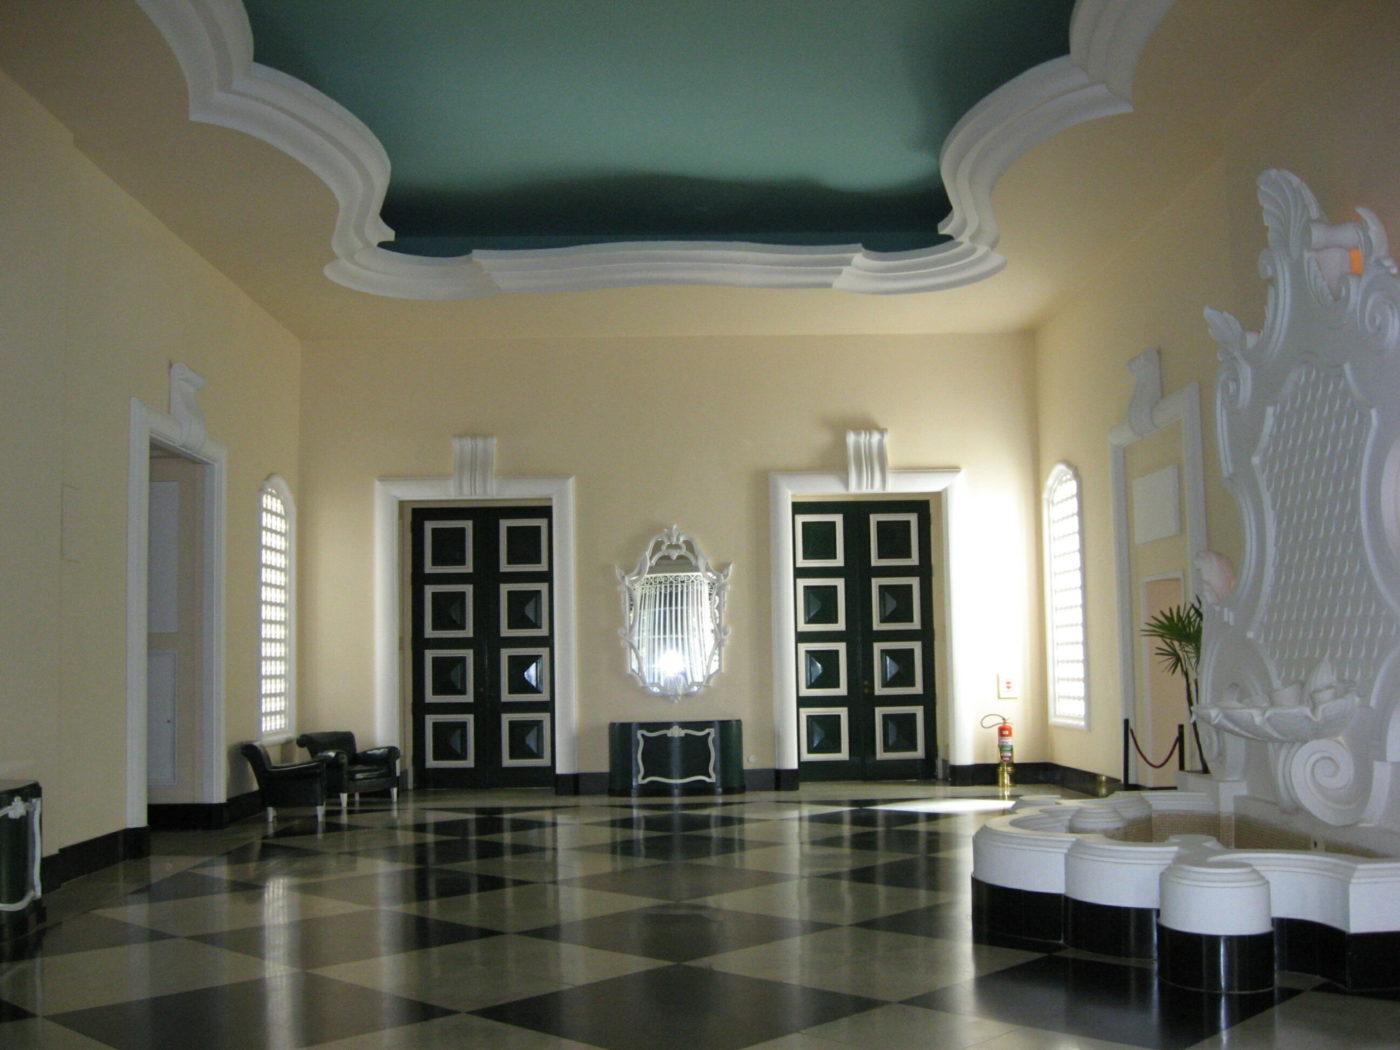 Palácio Quitandinha in Petropolis, Brazil, designed by Dorothy Draper in the Hollywood Regency, or Regency Morderne, style.